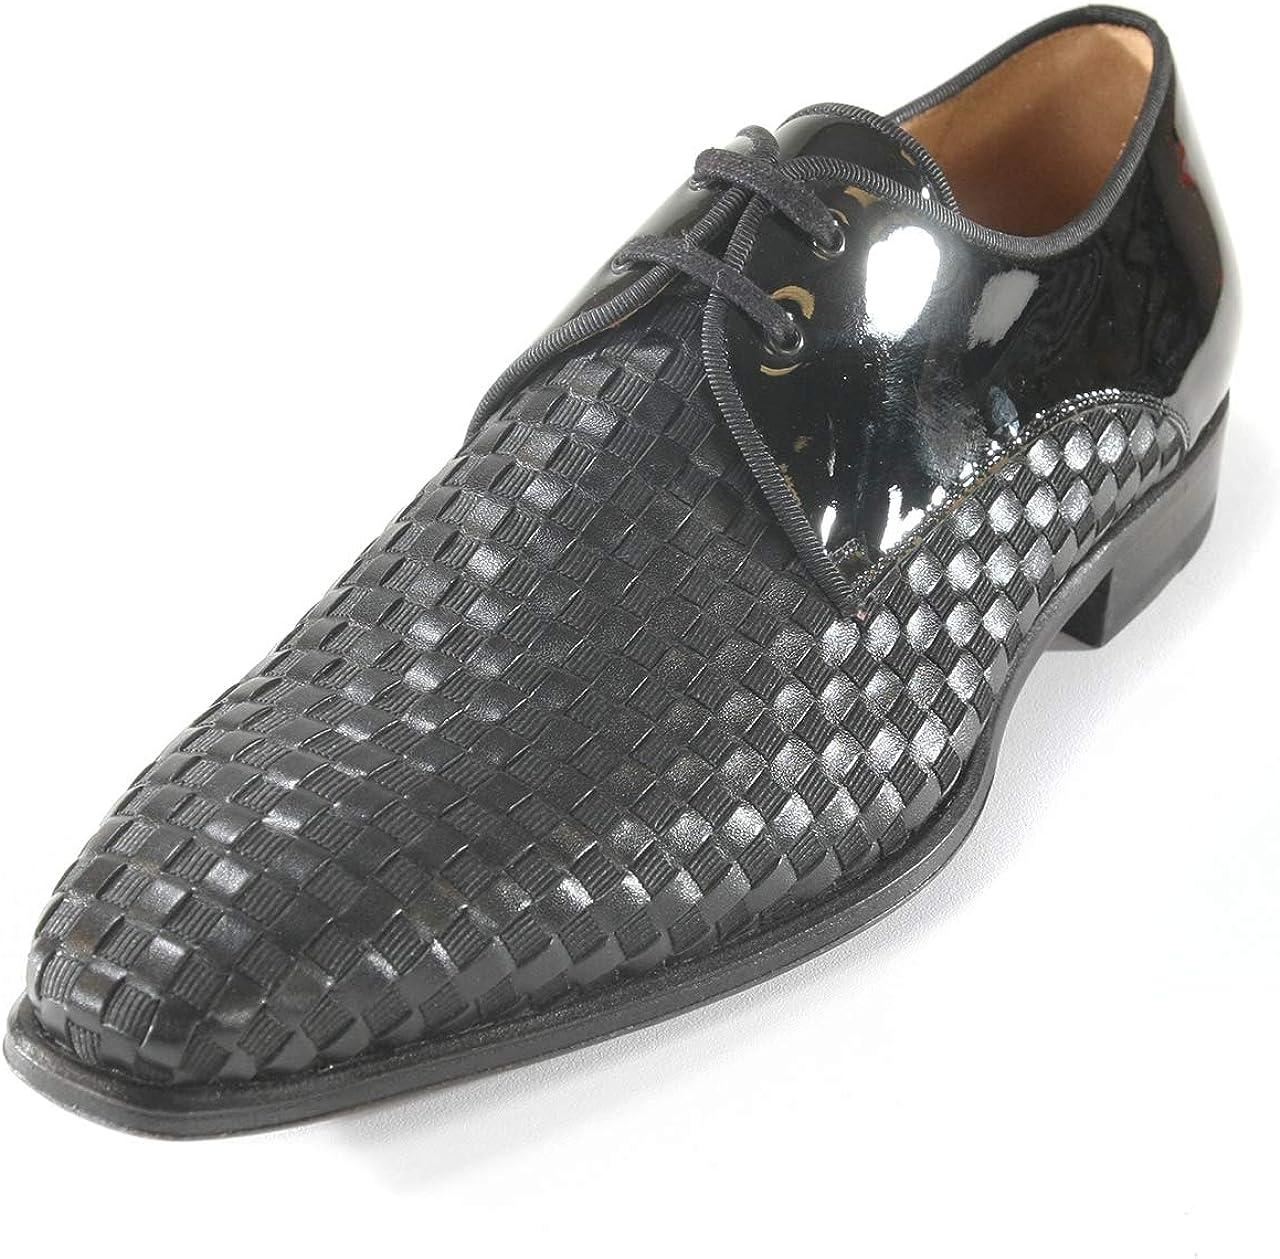 Mezlan Sexto Mens Luxury Dress Shoes